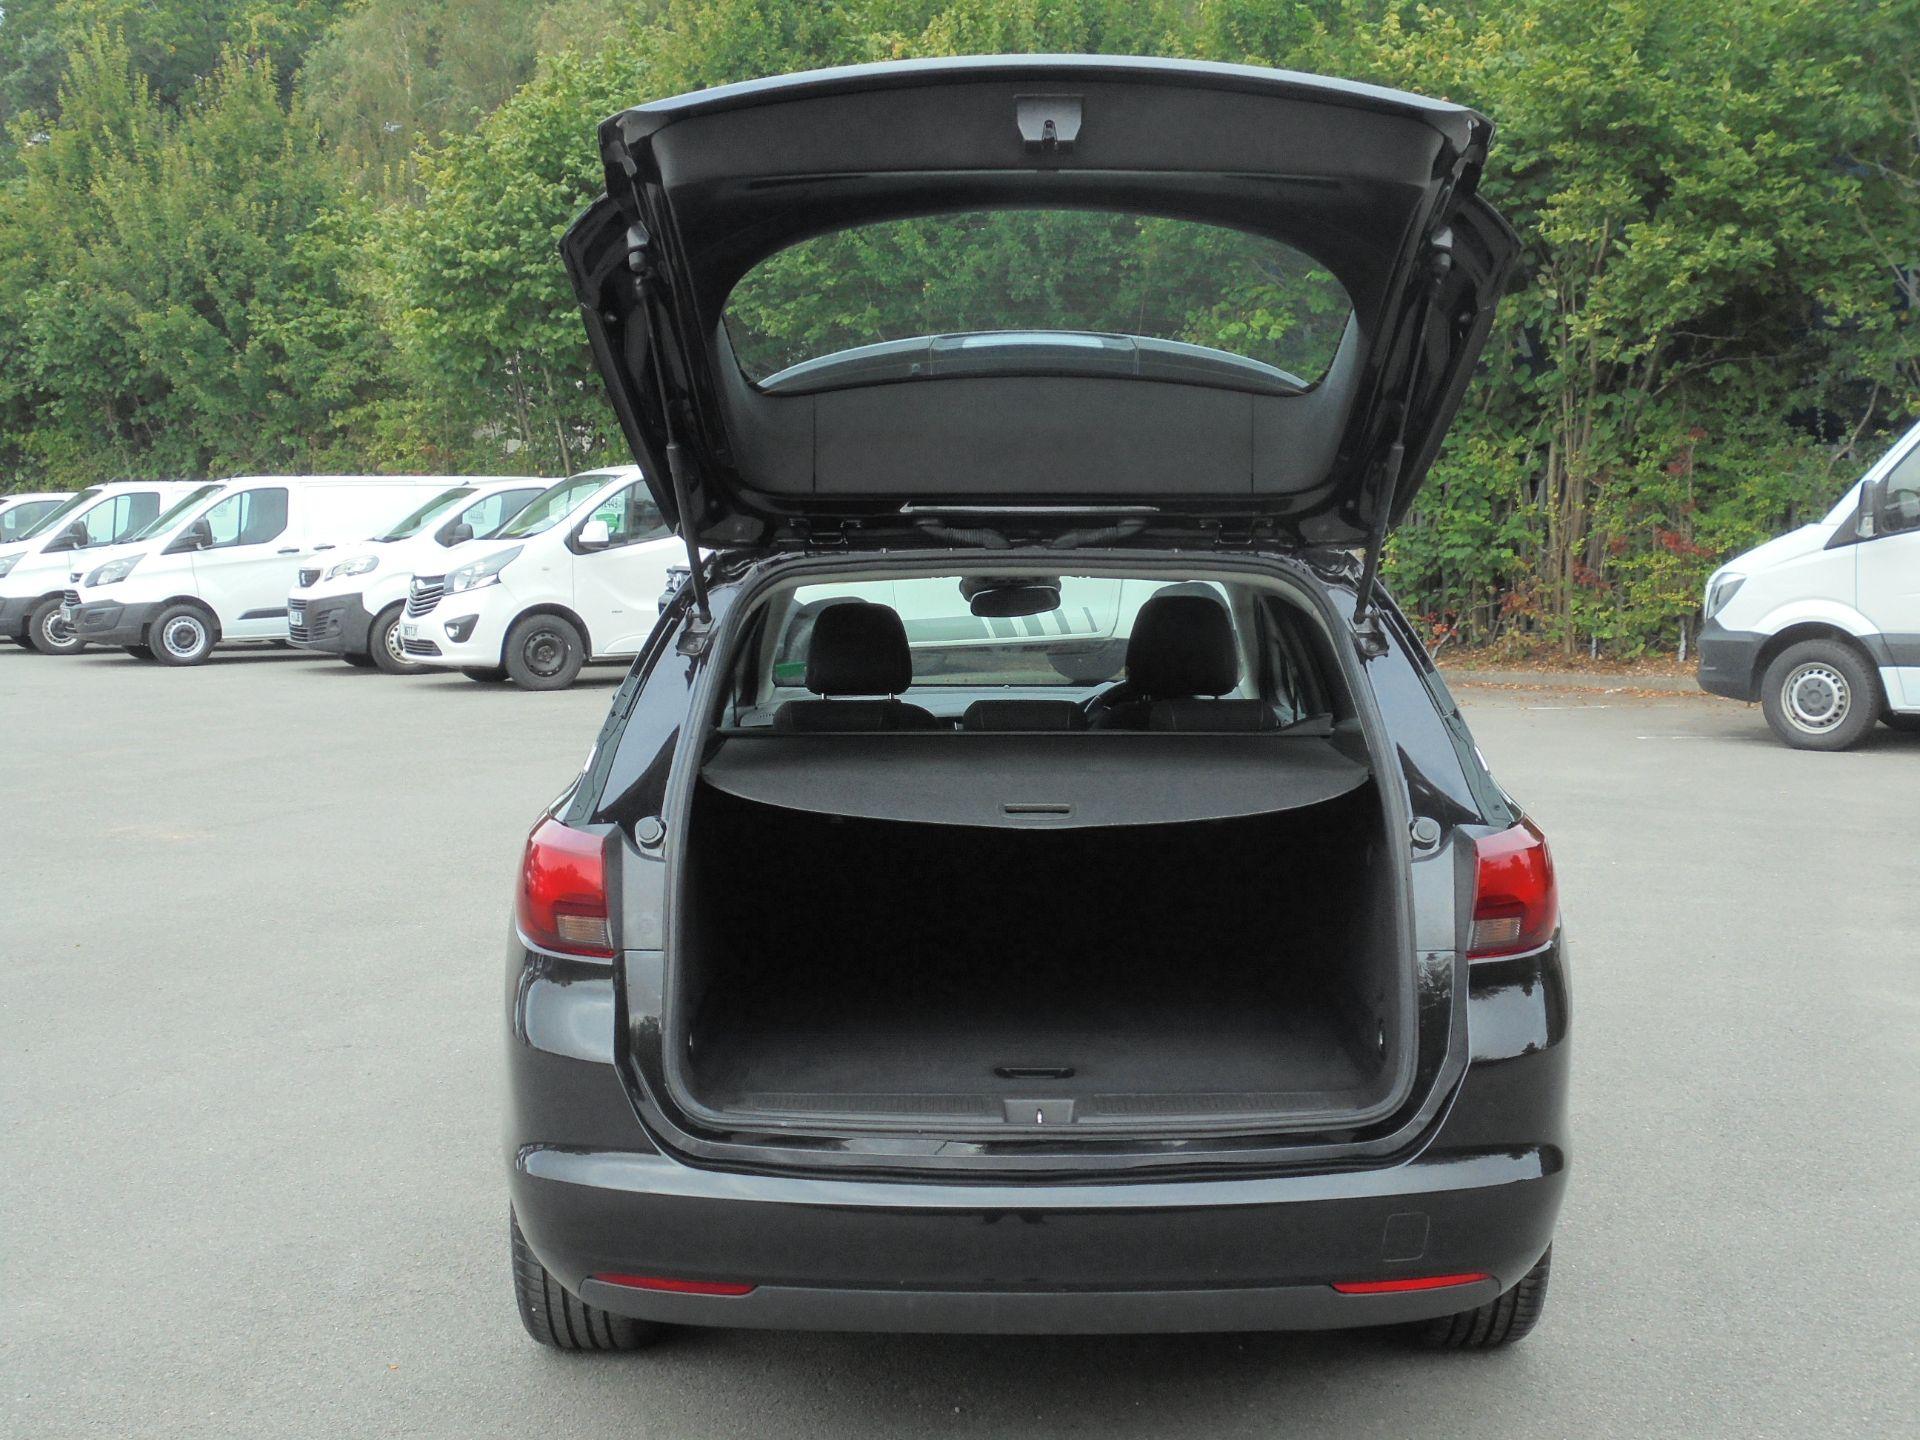 2018 Vauxhall Astra Sports Tourer 1.6 Cdti 16V 136 Sri Nav 5Dr (VU18DFJ) Image 8